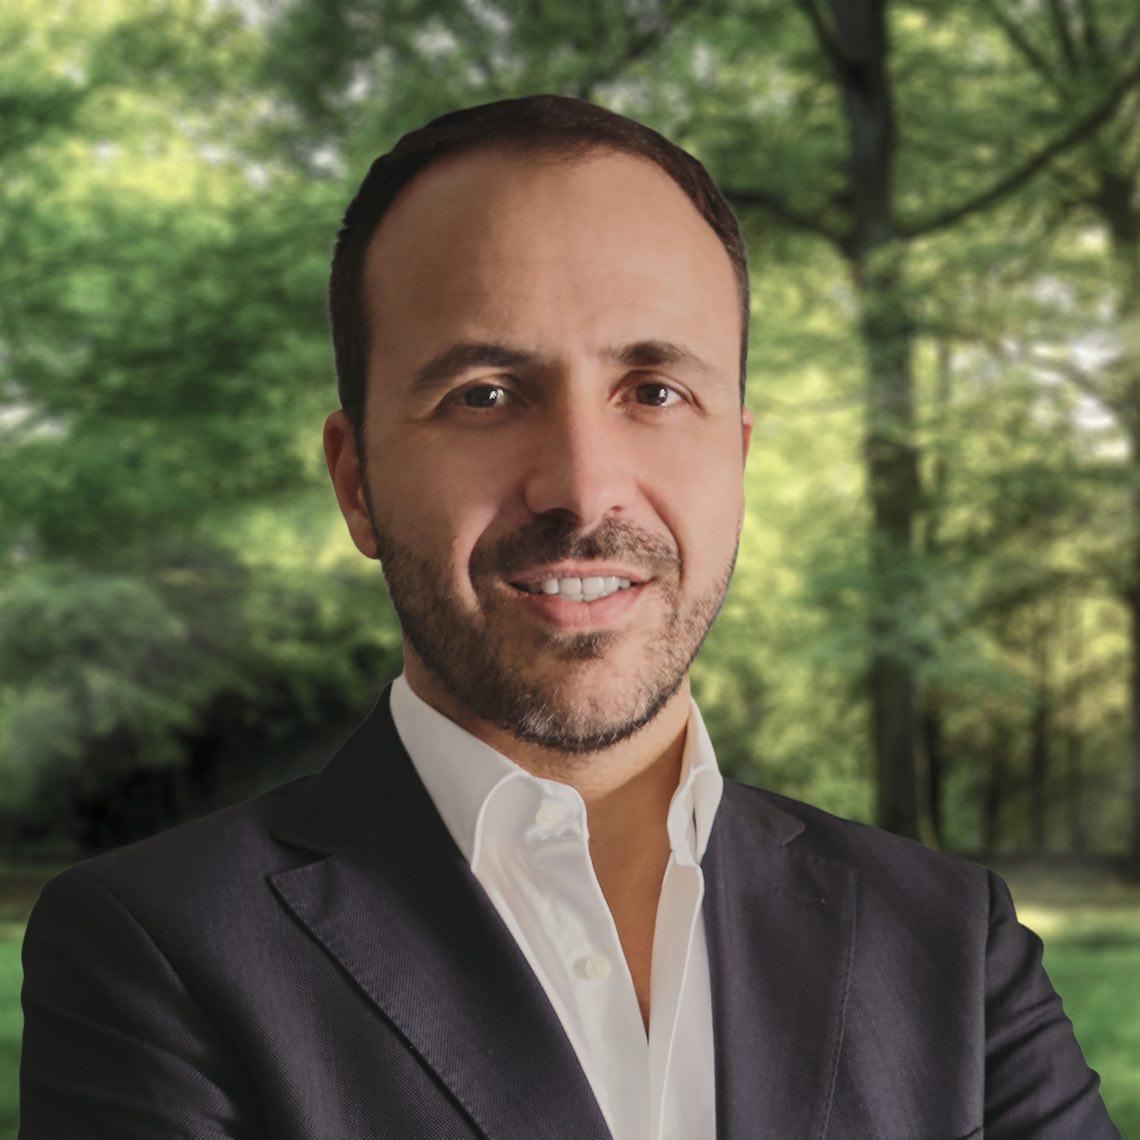 Marc Sampietro_Hines_Director of Living Operations